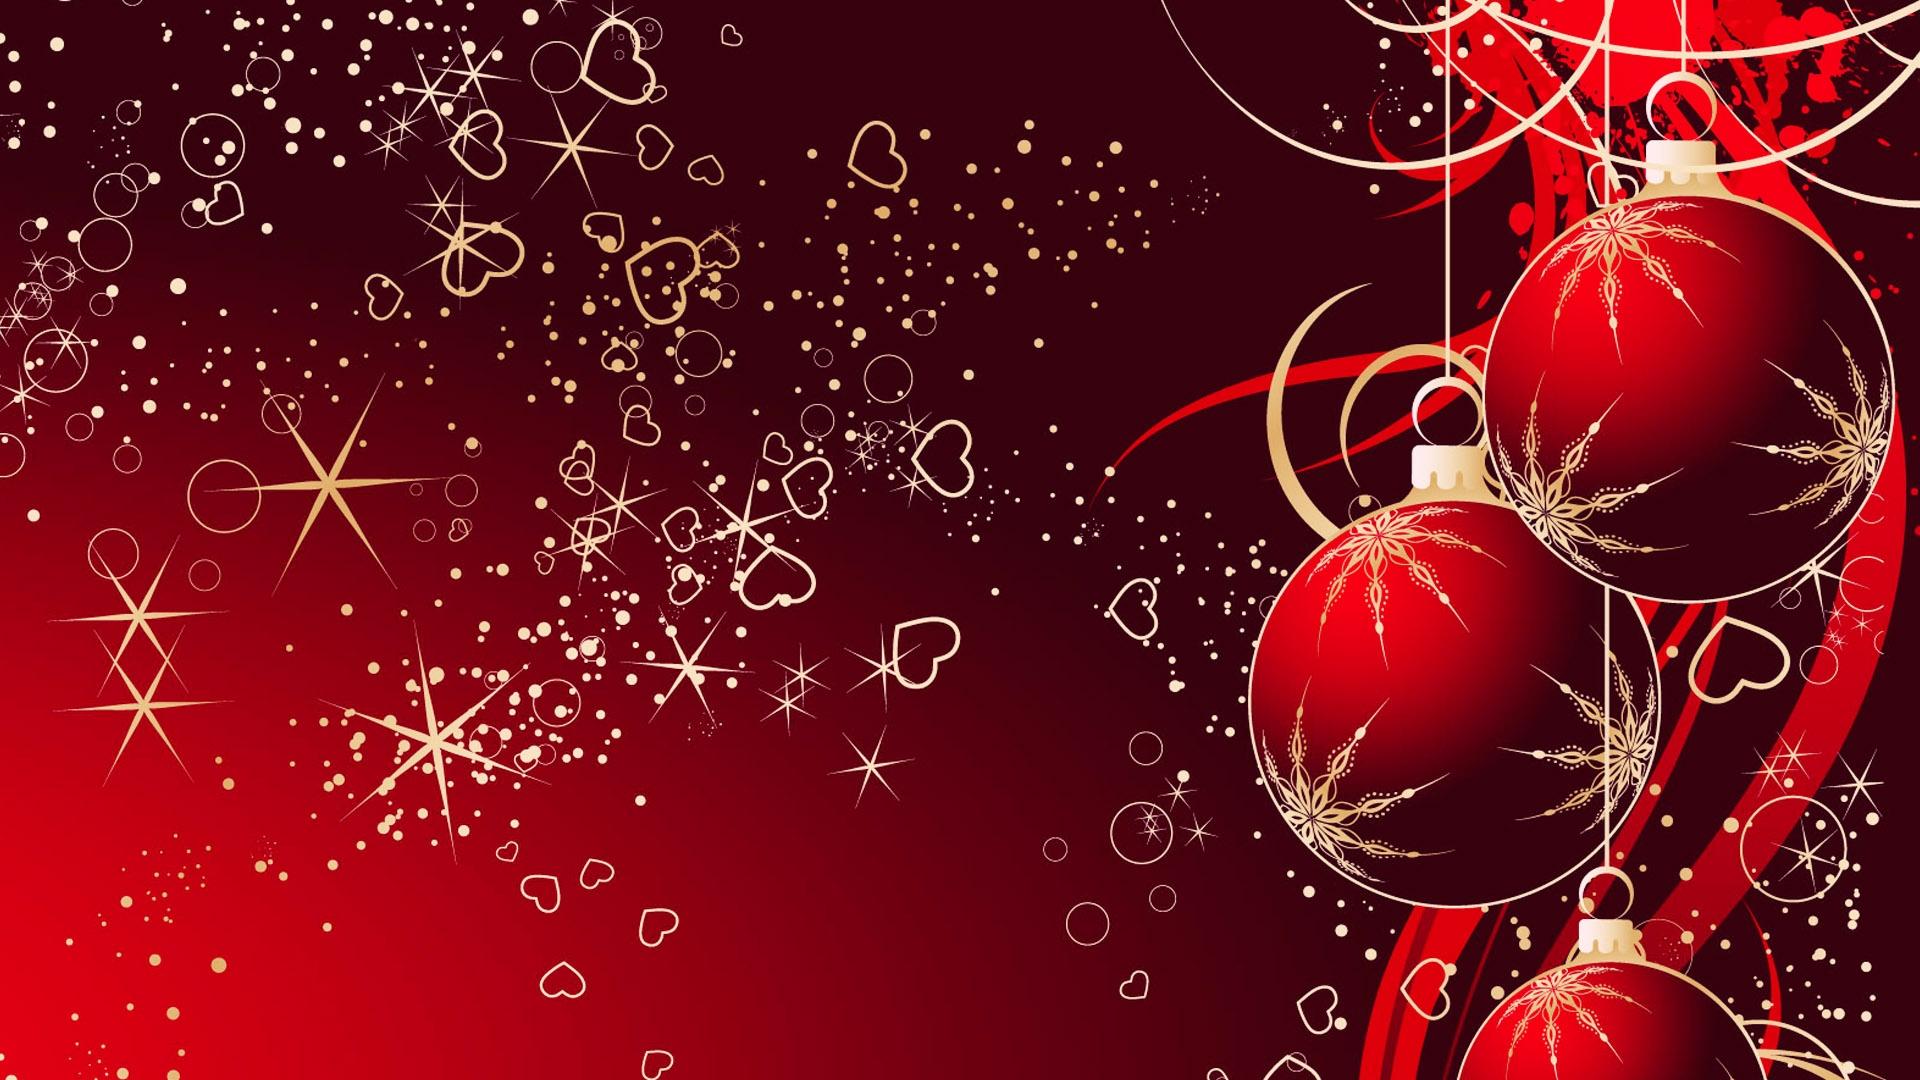 Christmas HD wallpaper 1920x1080 43060 1920x1080